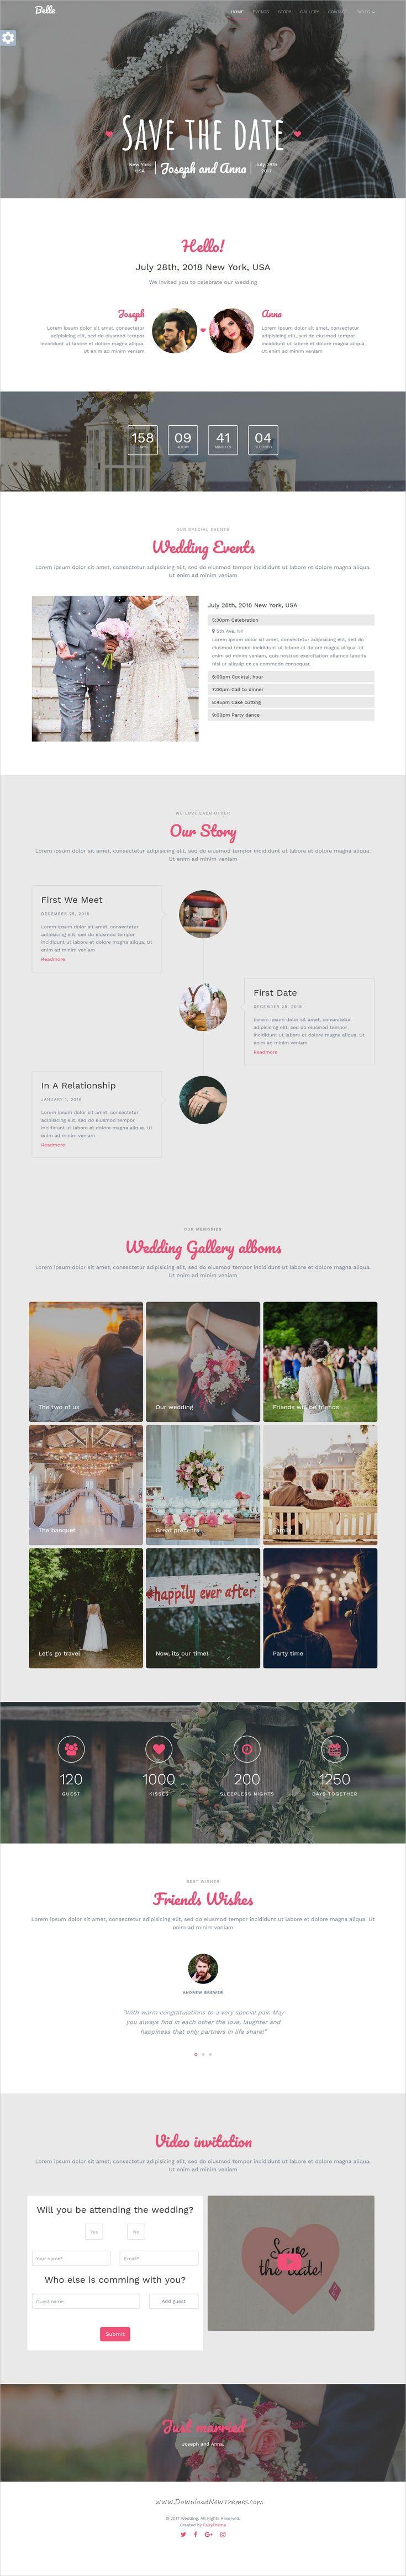 wedding invitation template themeforest%0A Belle  Responsive Wedding Template